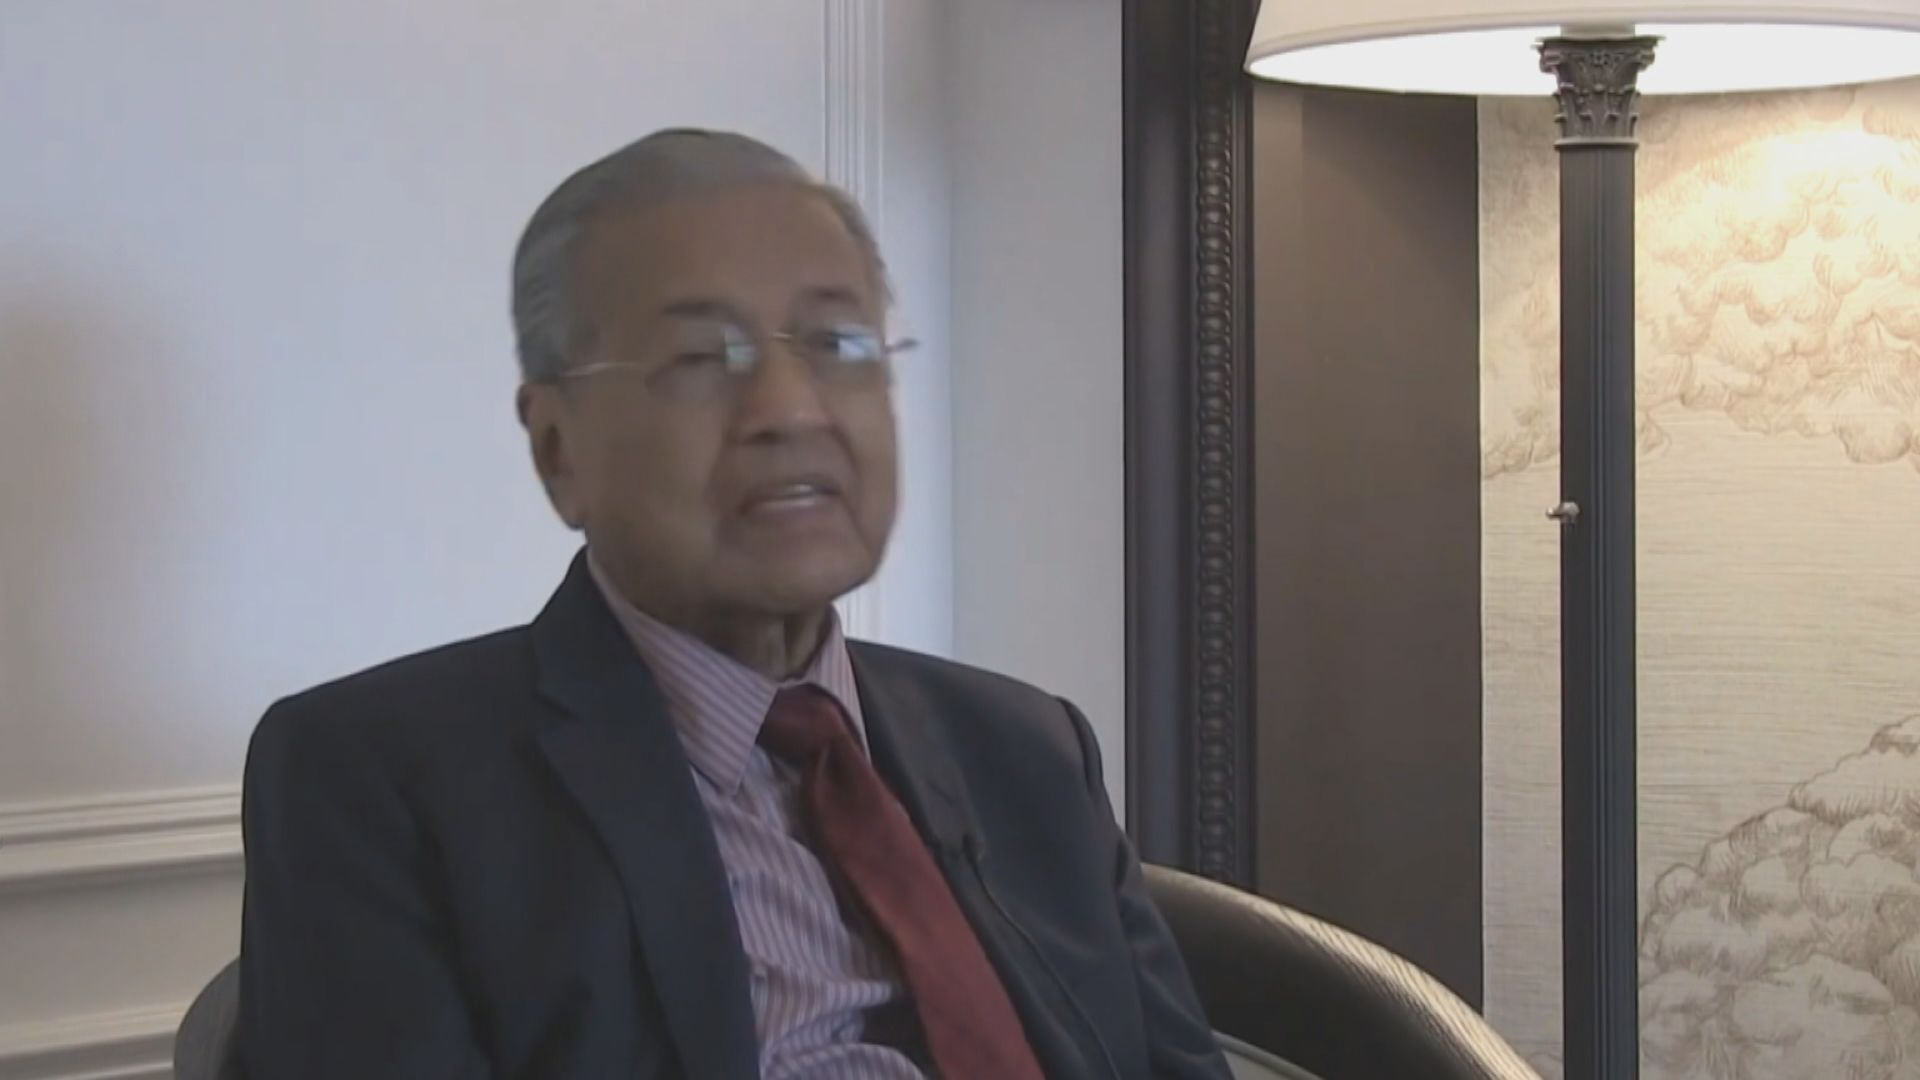 馬哈蒂爾稱無意與中國對抗